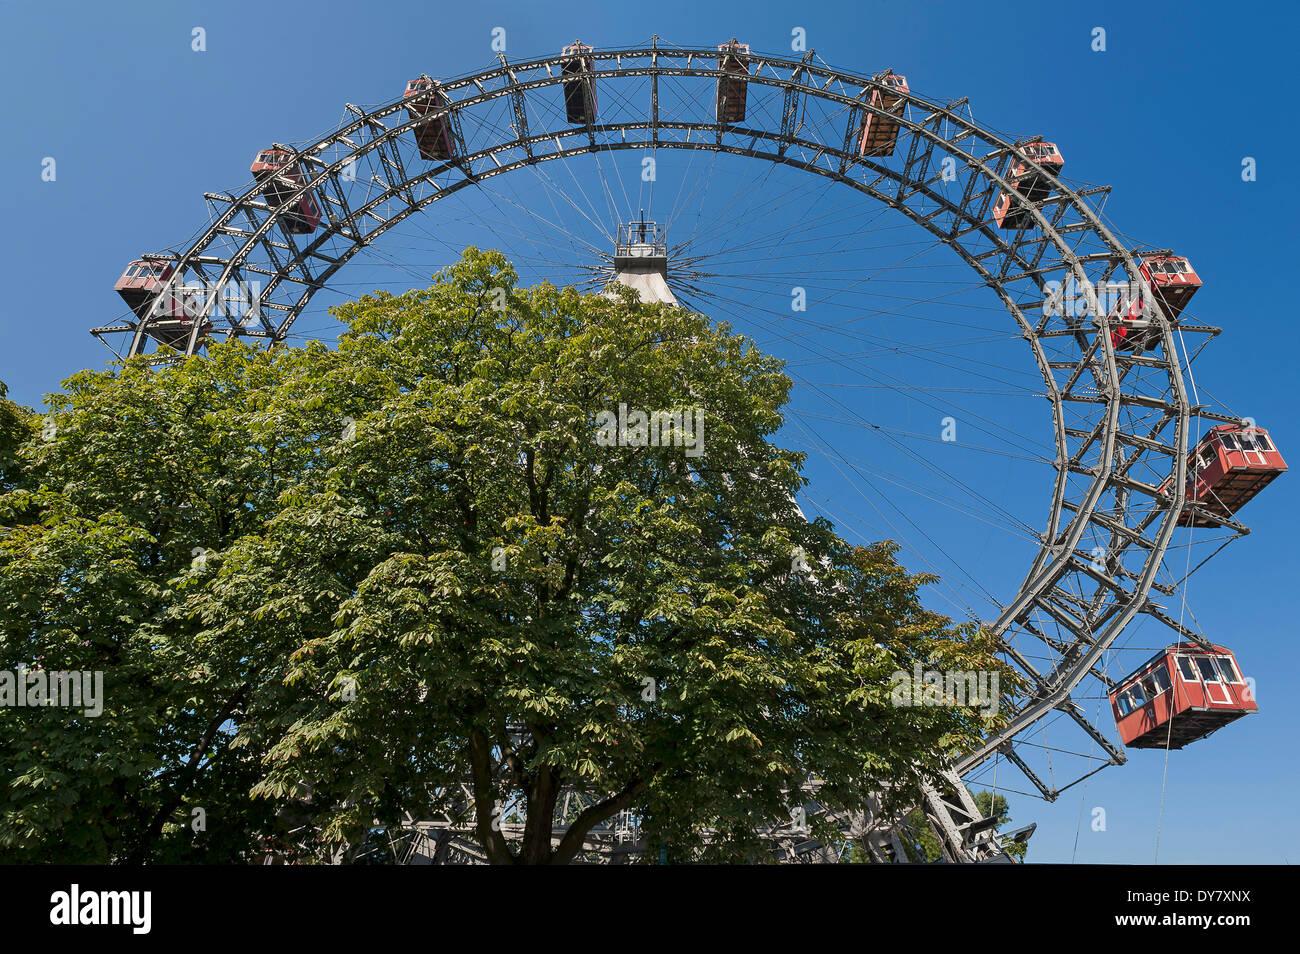 Wiener Riesenrad ferris wheel against a blue sky at the Prater, Vienna, Austria - Stock Image